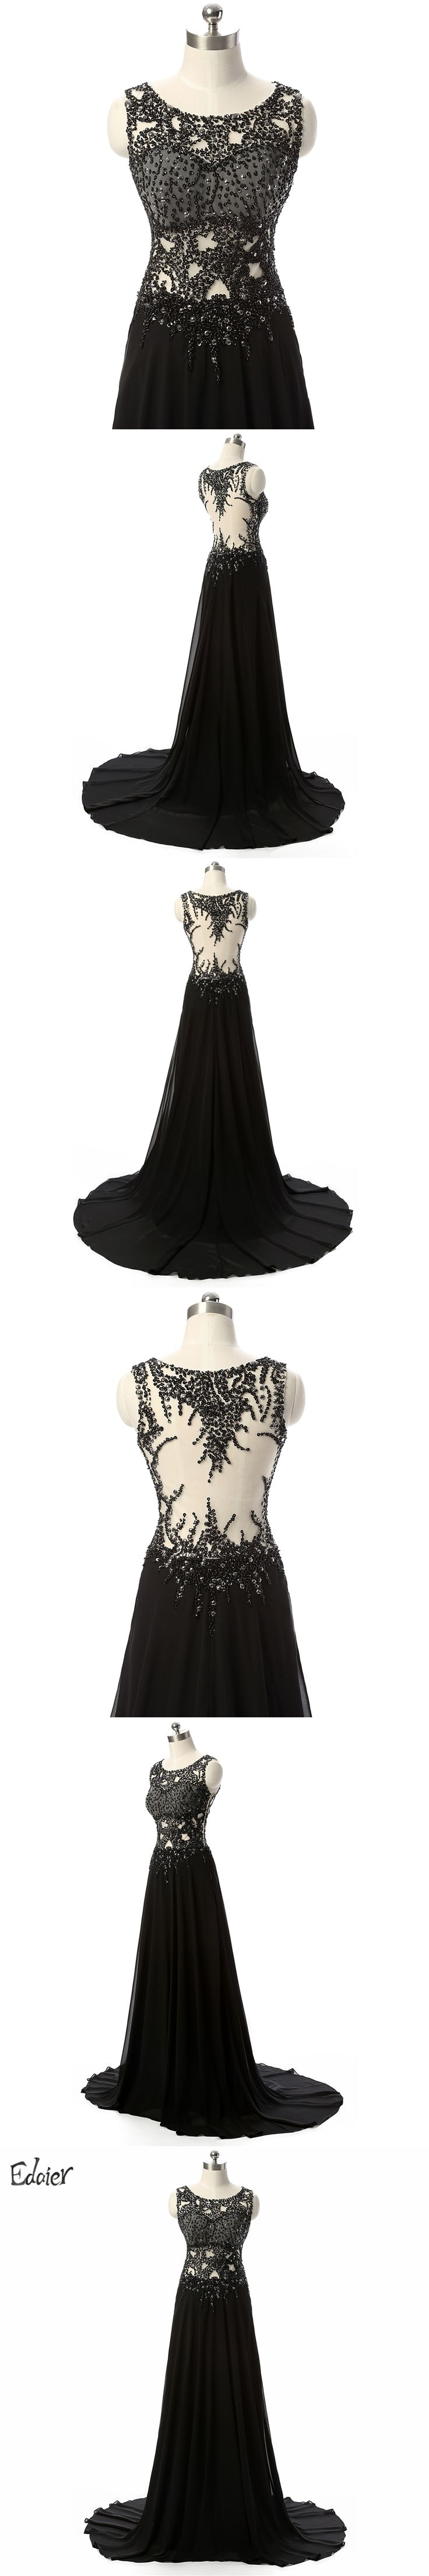 Edaier Long Black Evening Dresses 2017 A Line Scoop Beaded Sequined Prom Dress Sheer Back Chiffon Evening Gown Vestido De Festa